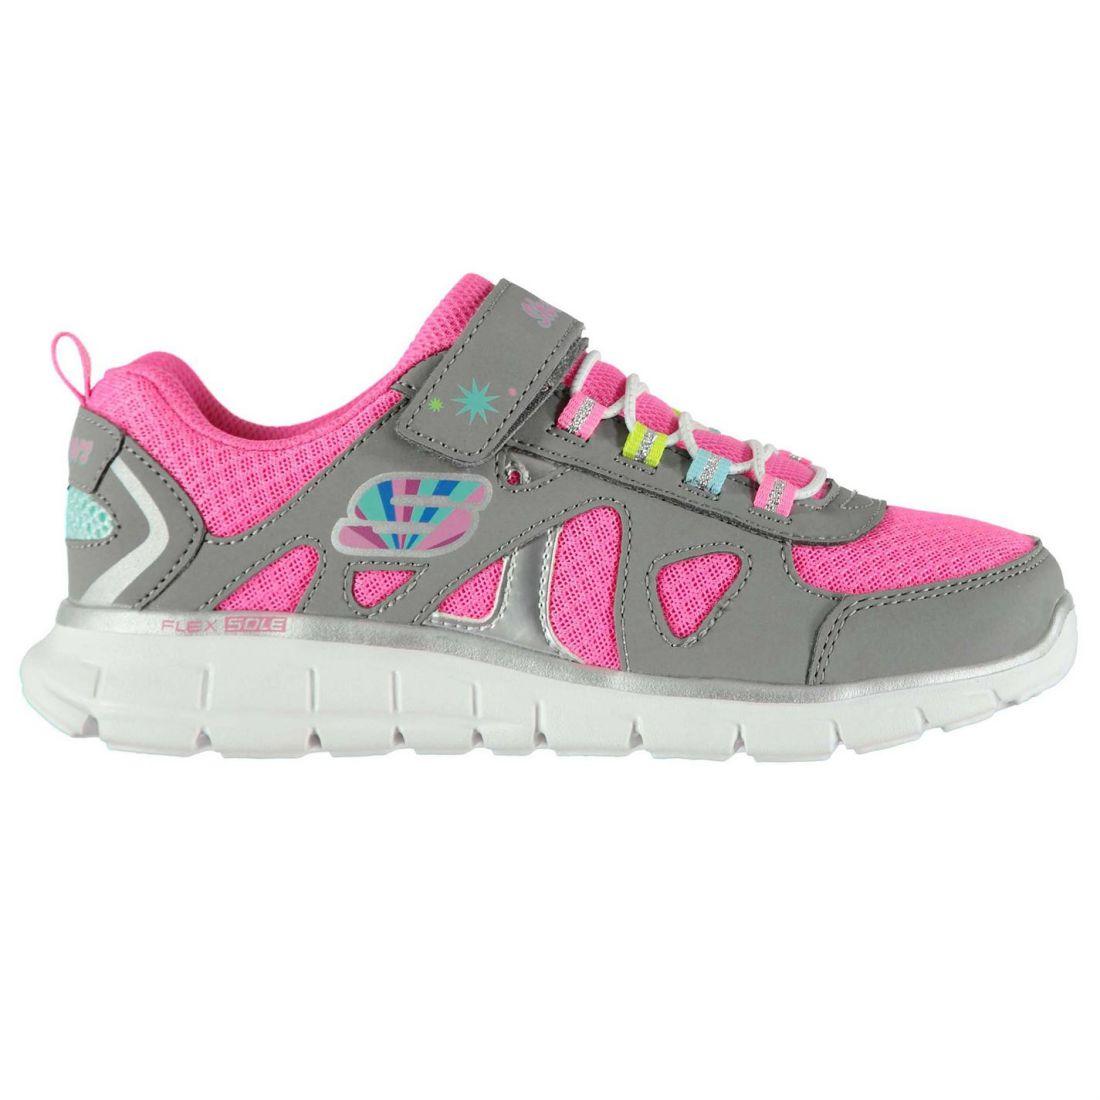 c3ec6e6bc Skechers Kids Vim Brite Childs Trainers Runners Elasticated Laces ...